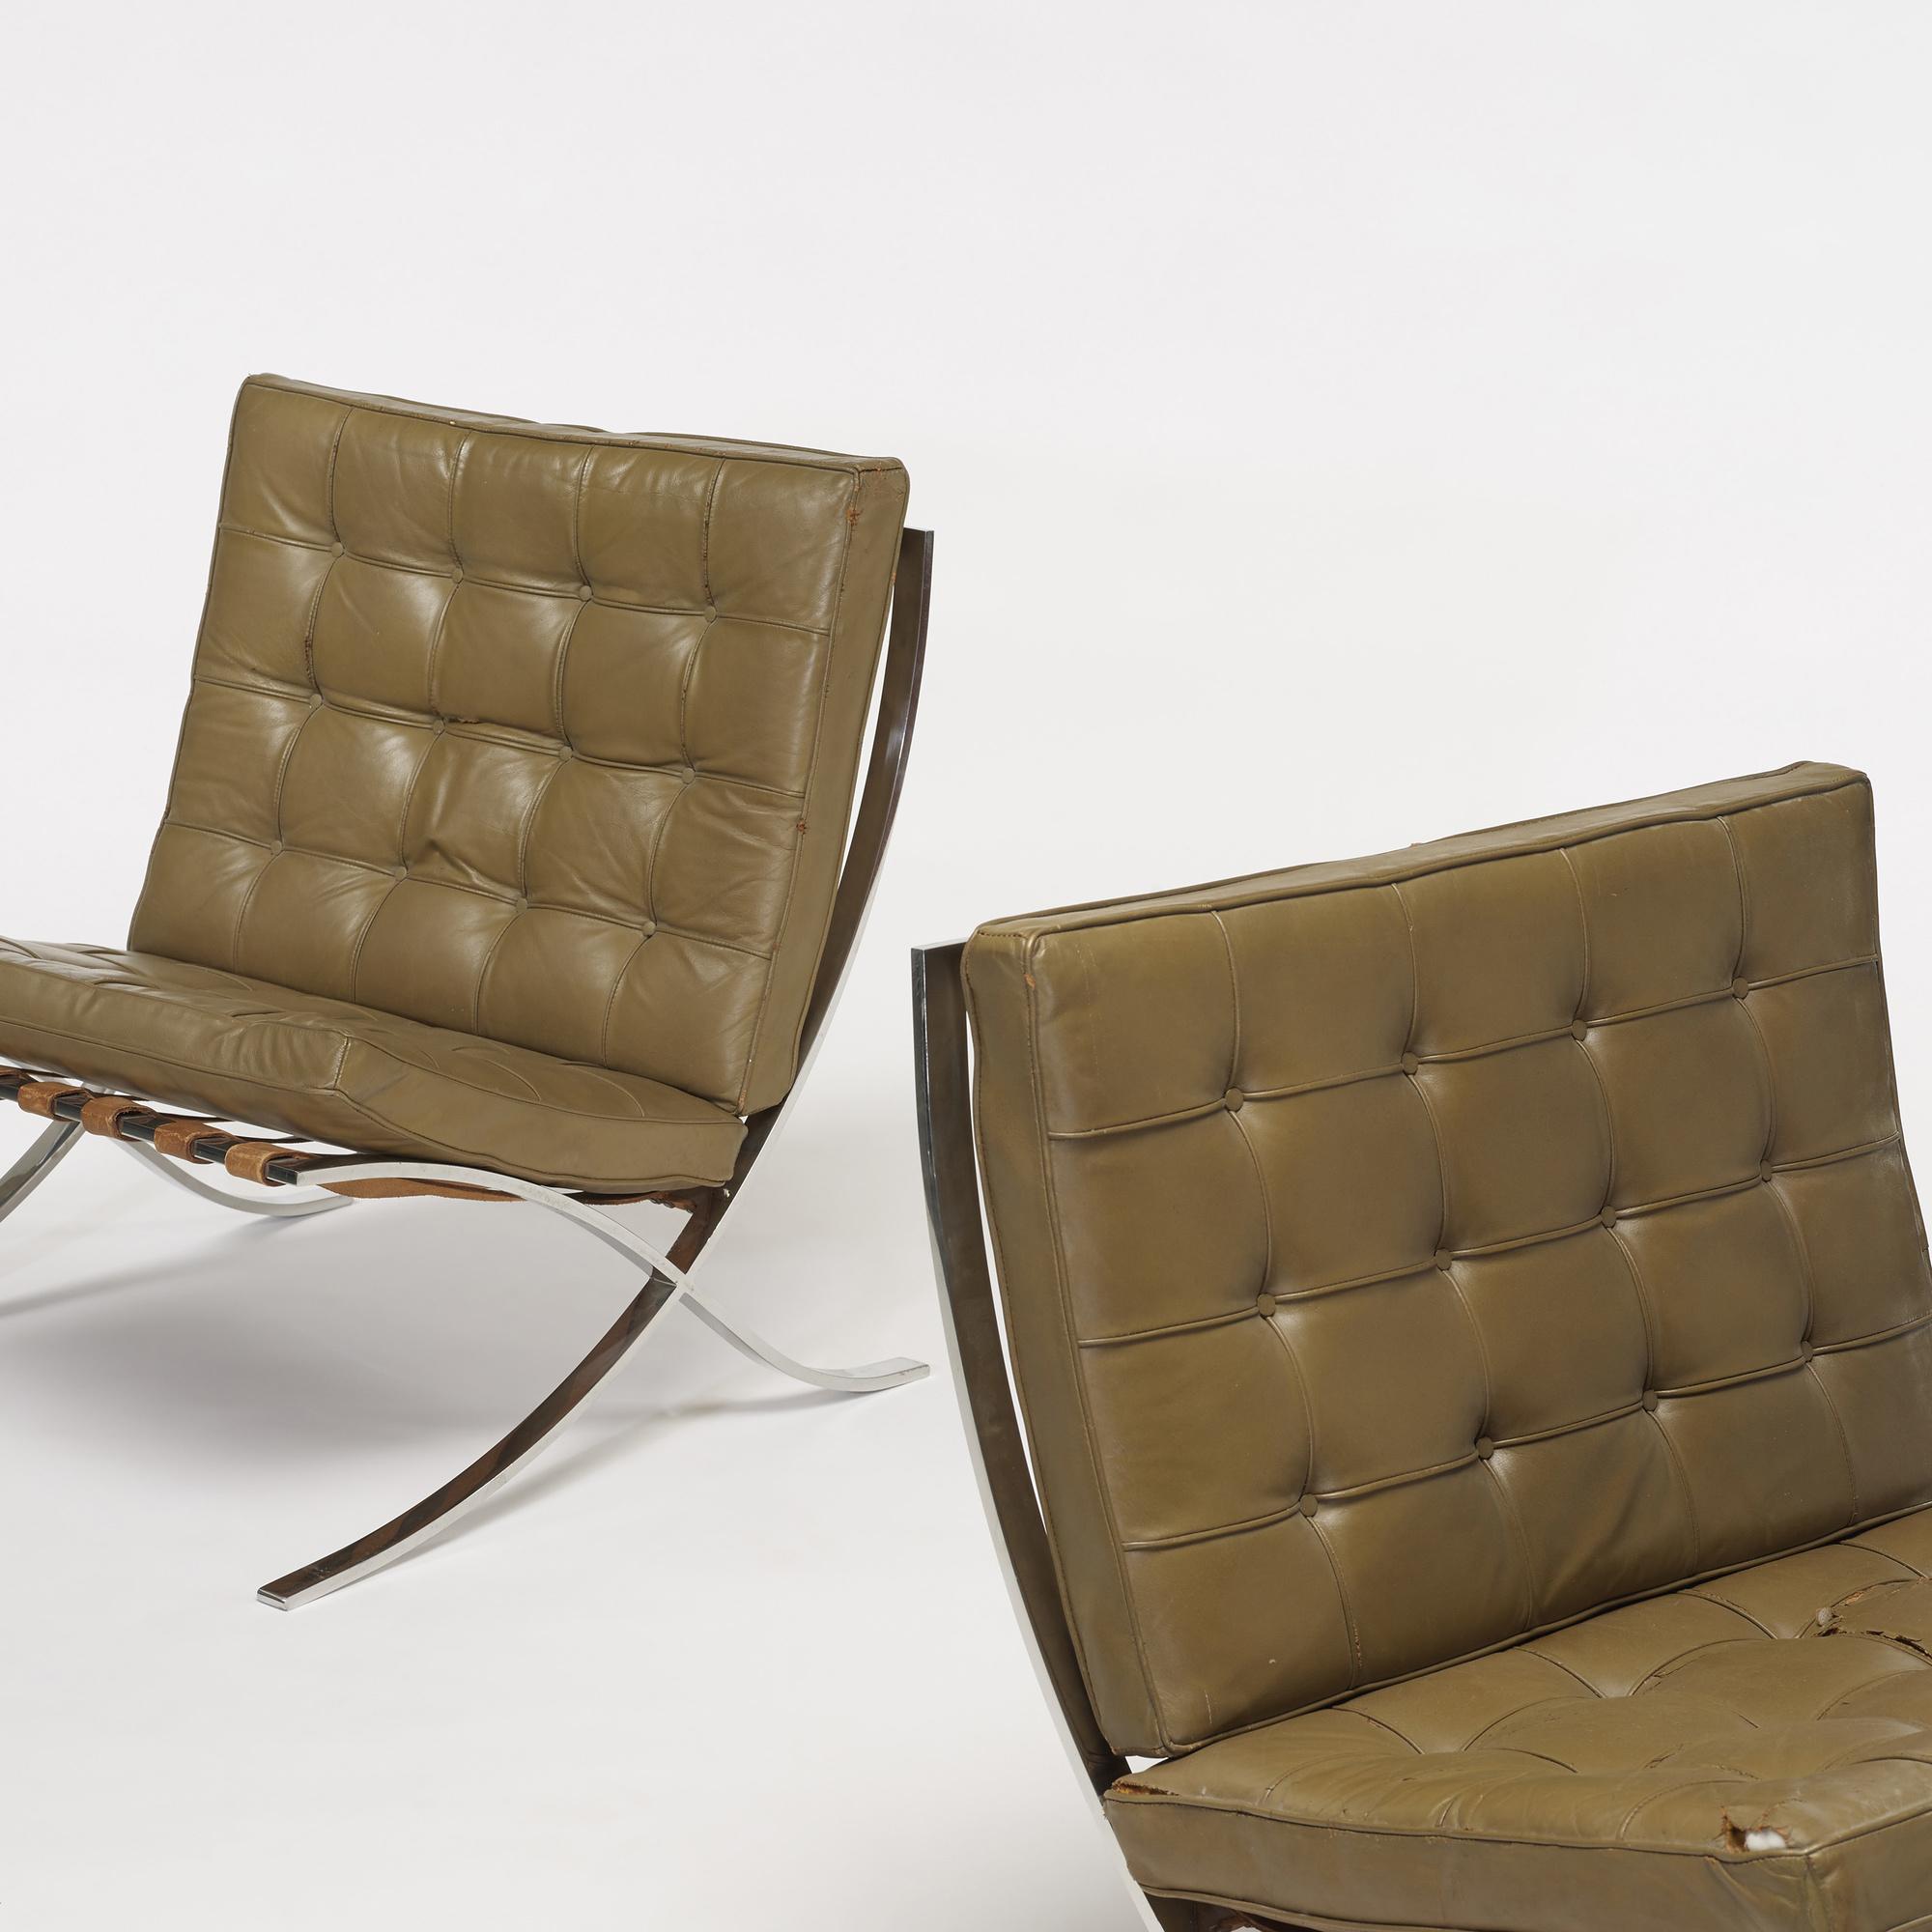 barcalona chairs2.jpg